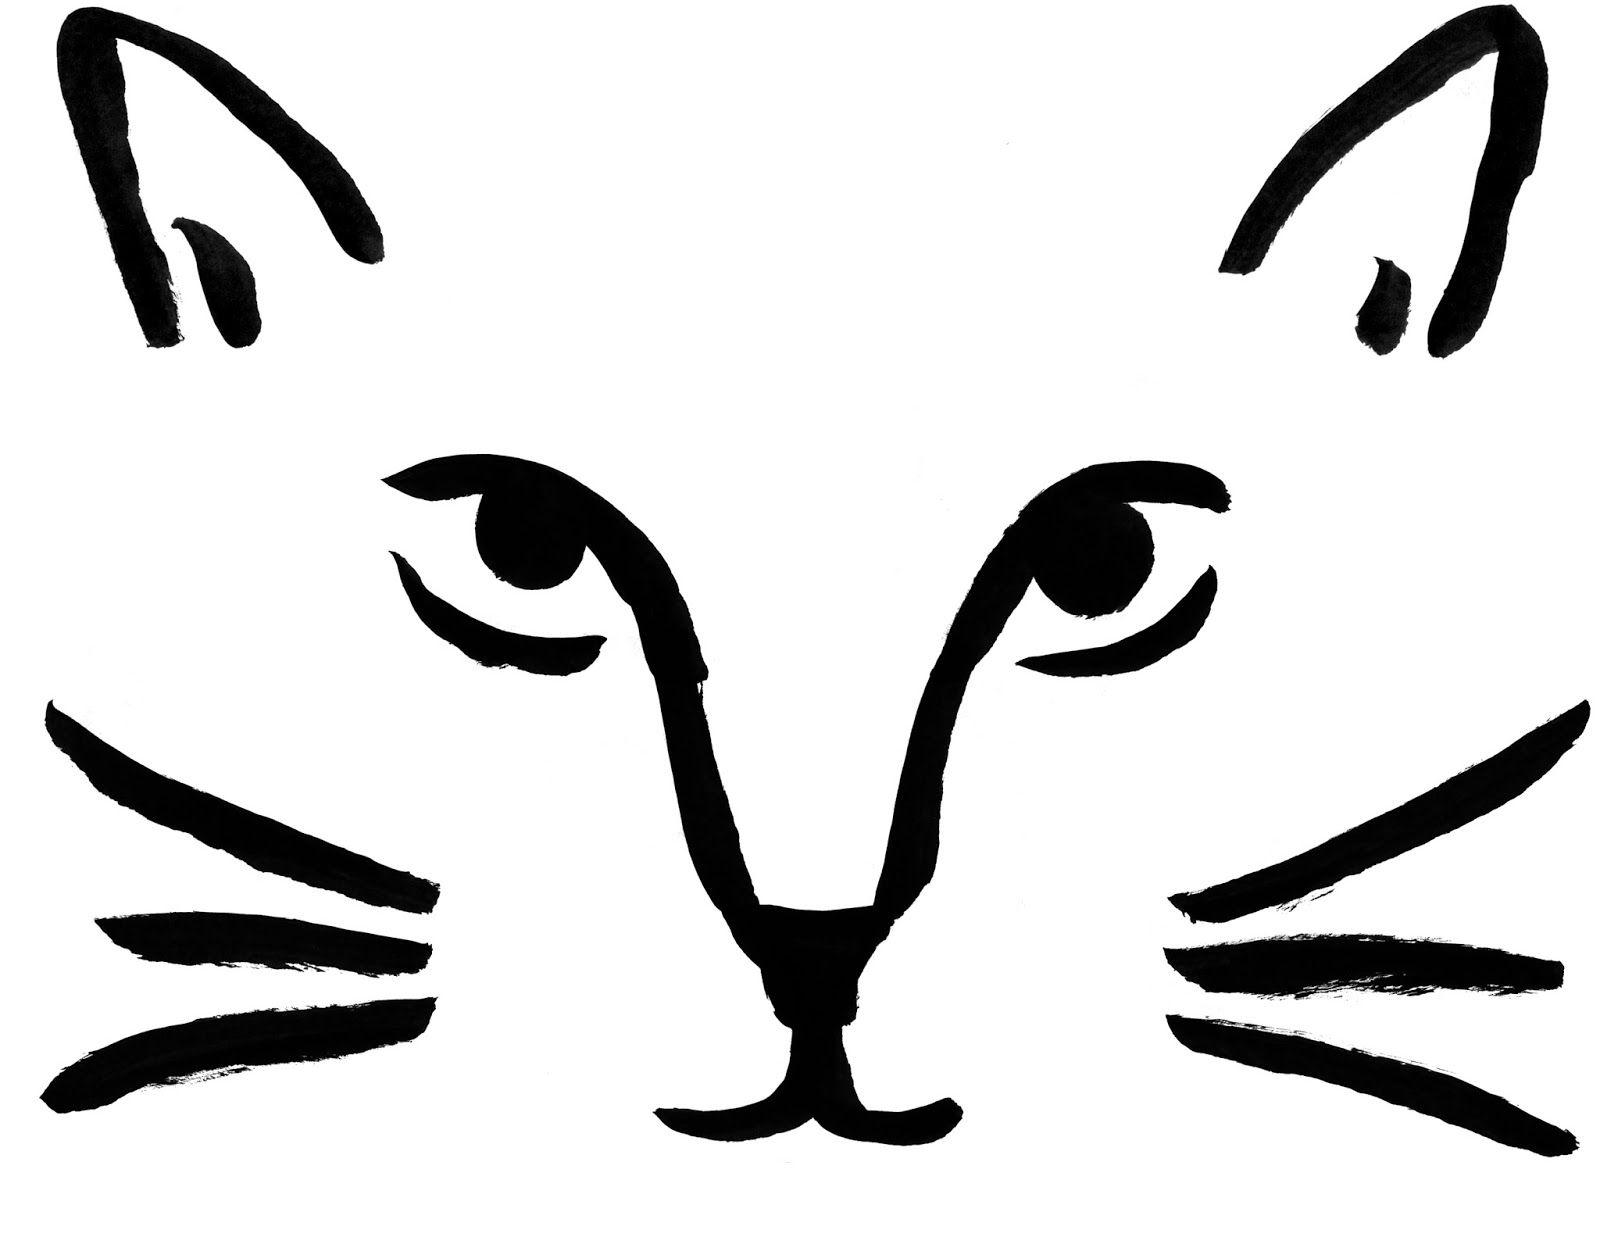 Download Cat face pumpkin carving pattern stencil template designs ...